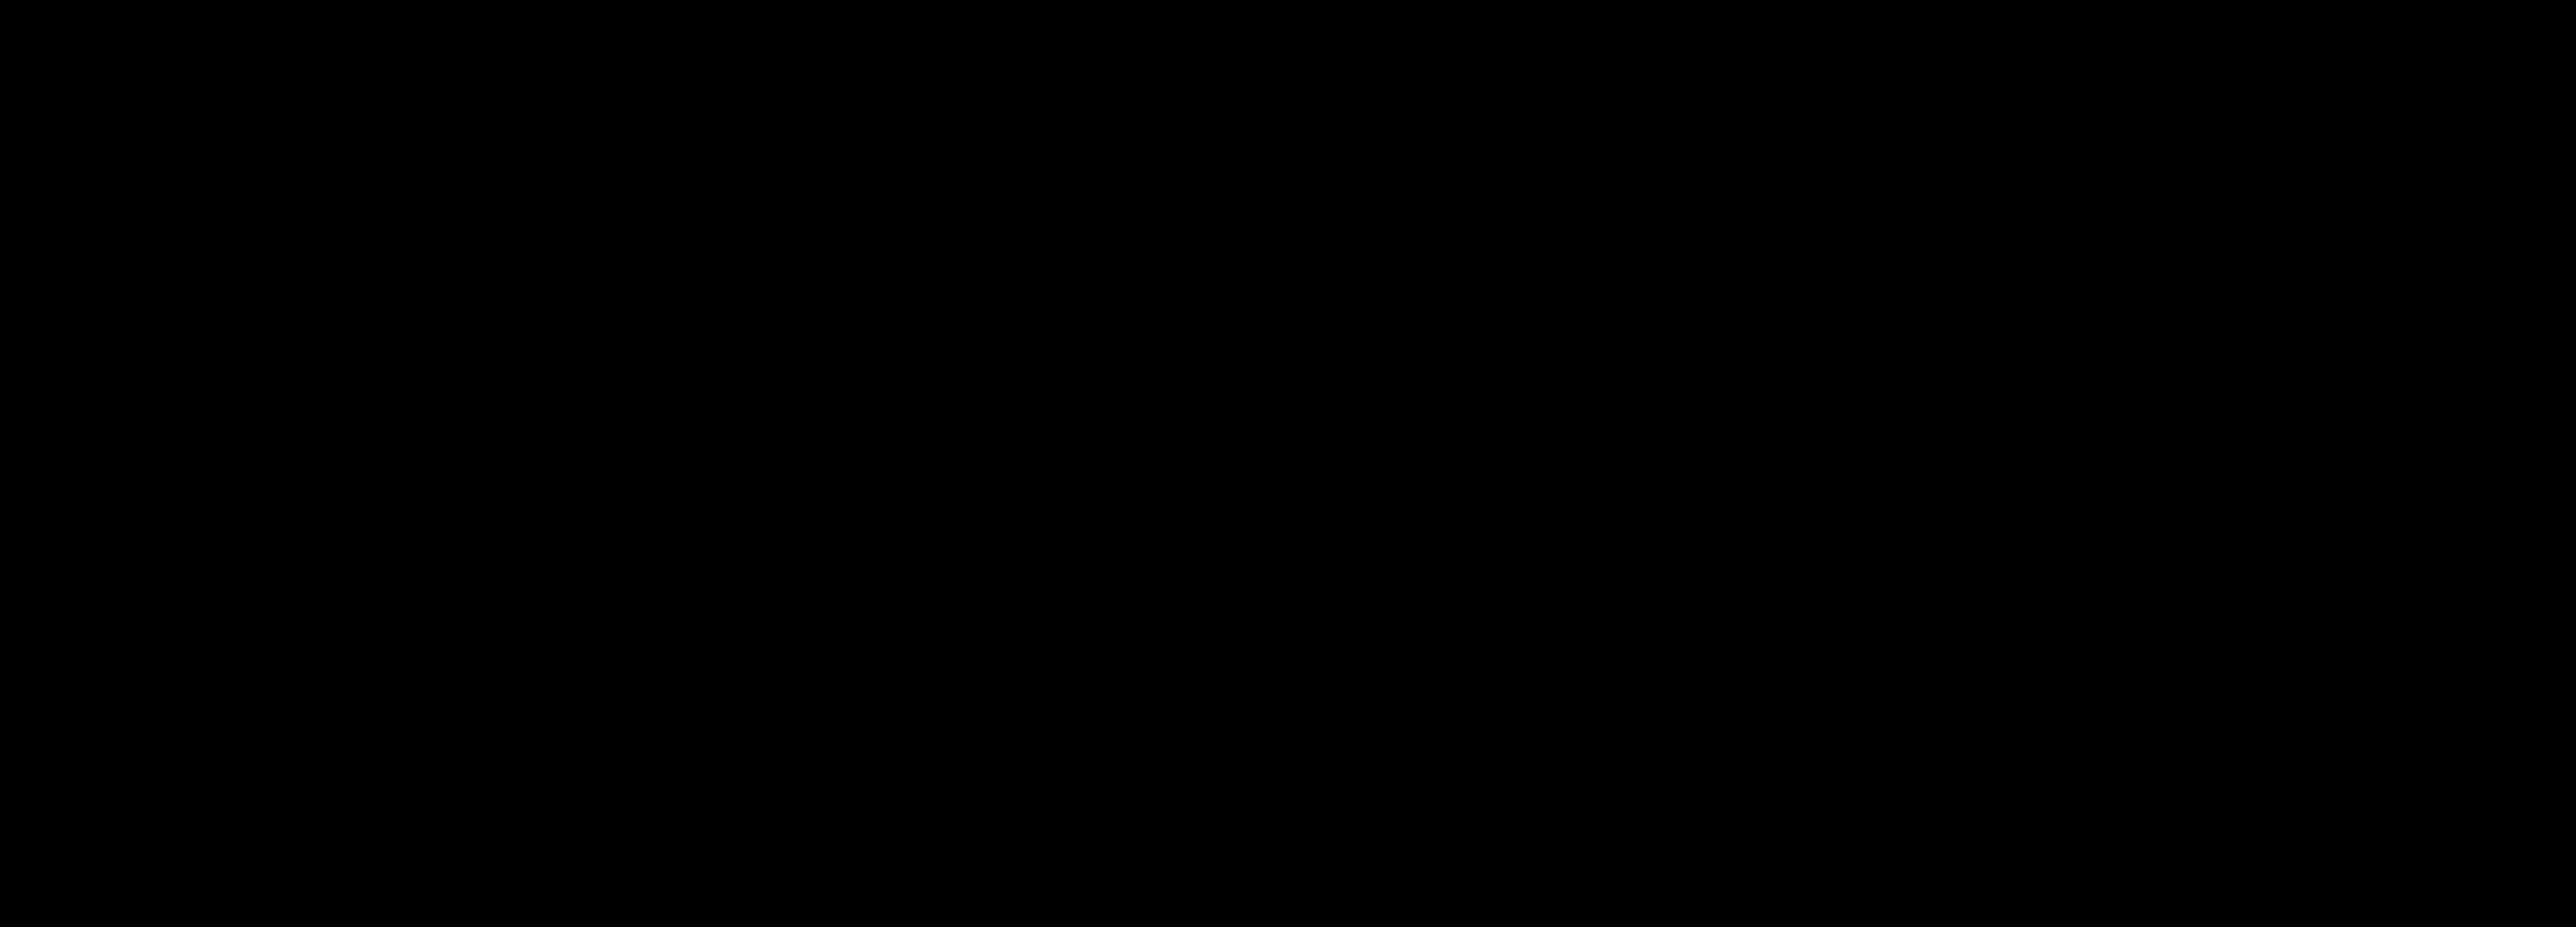 Nike logo, emblem, logotype